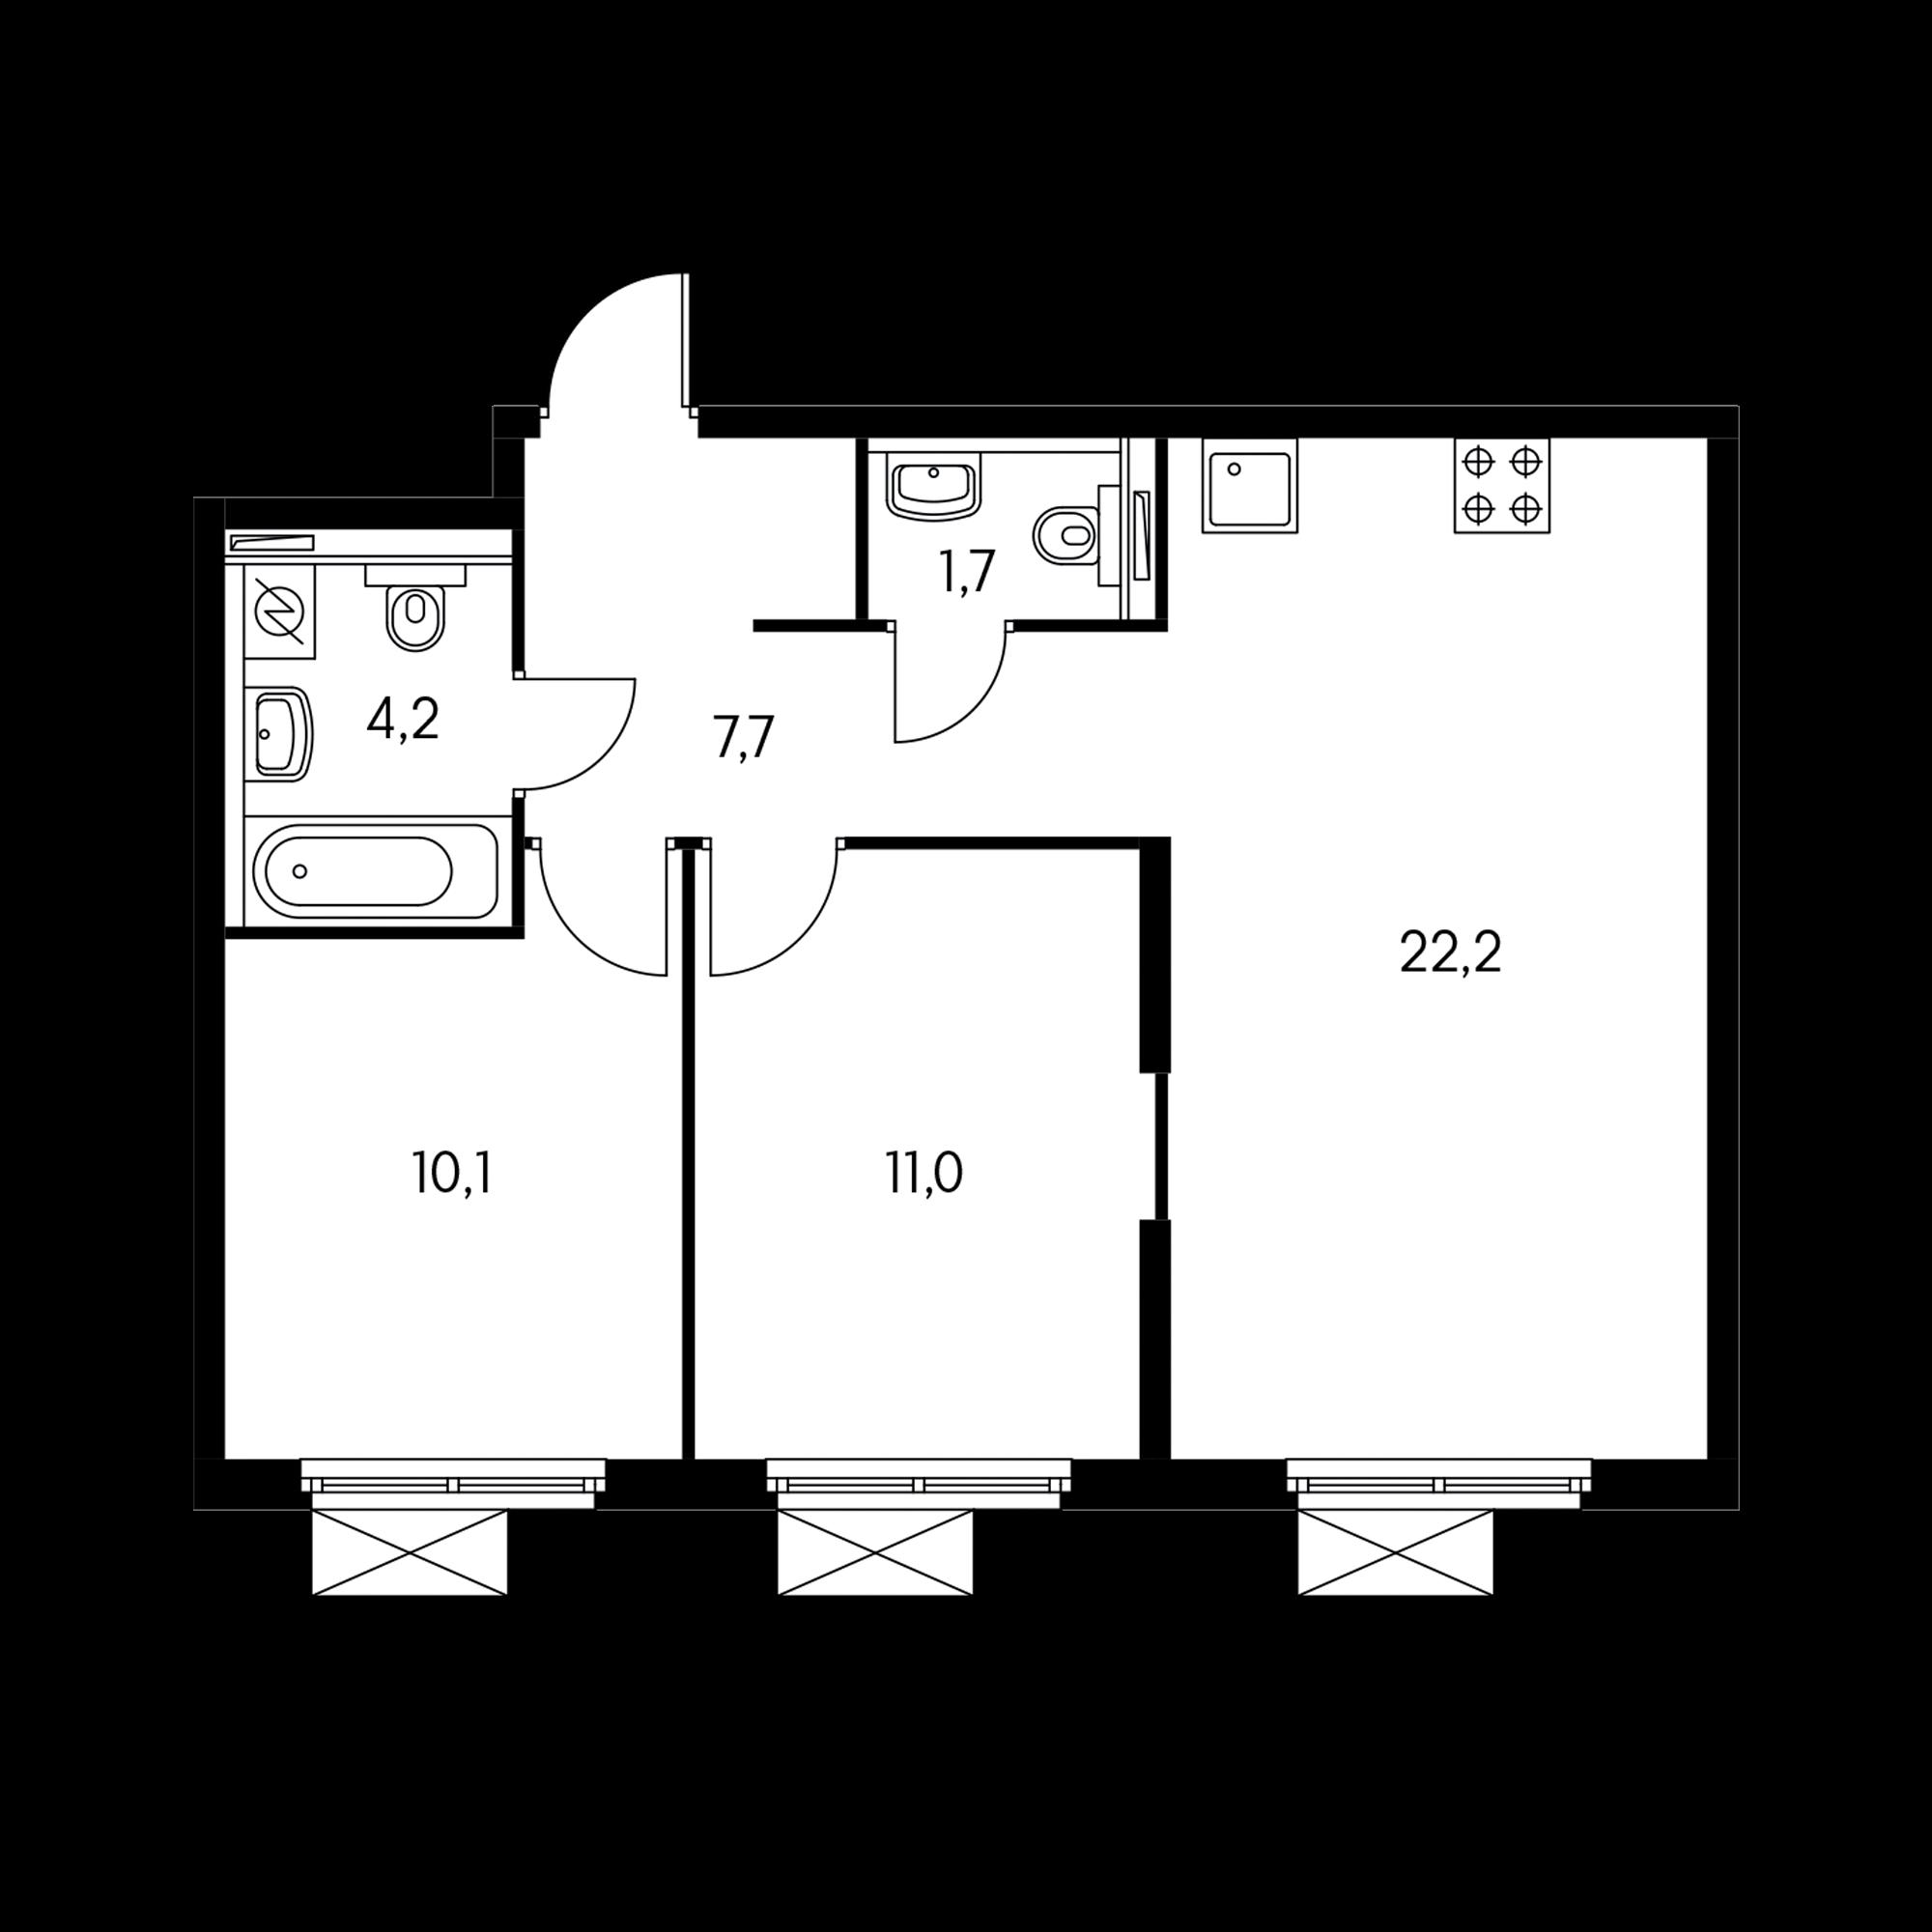 2EM7_9.6-1